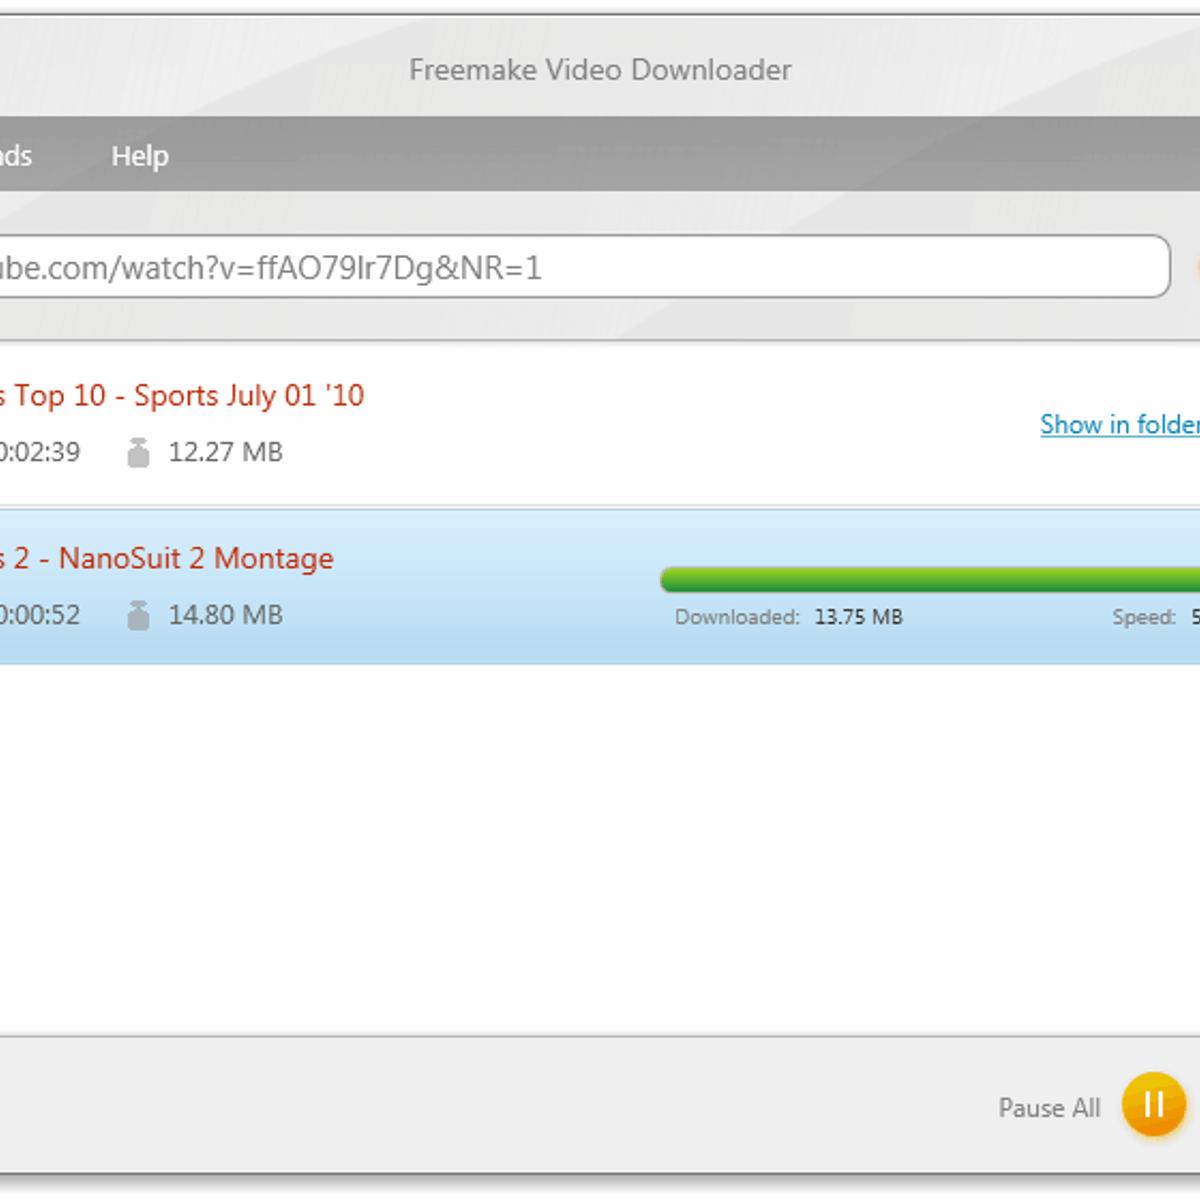 freemake video downloader premium pack key 2018